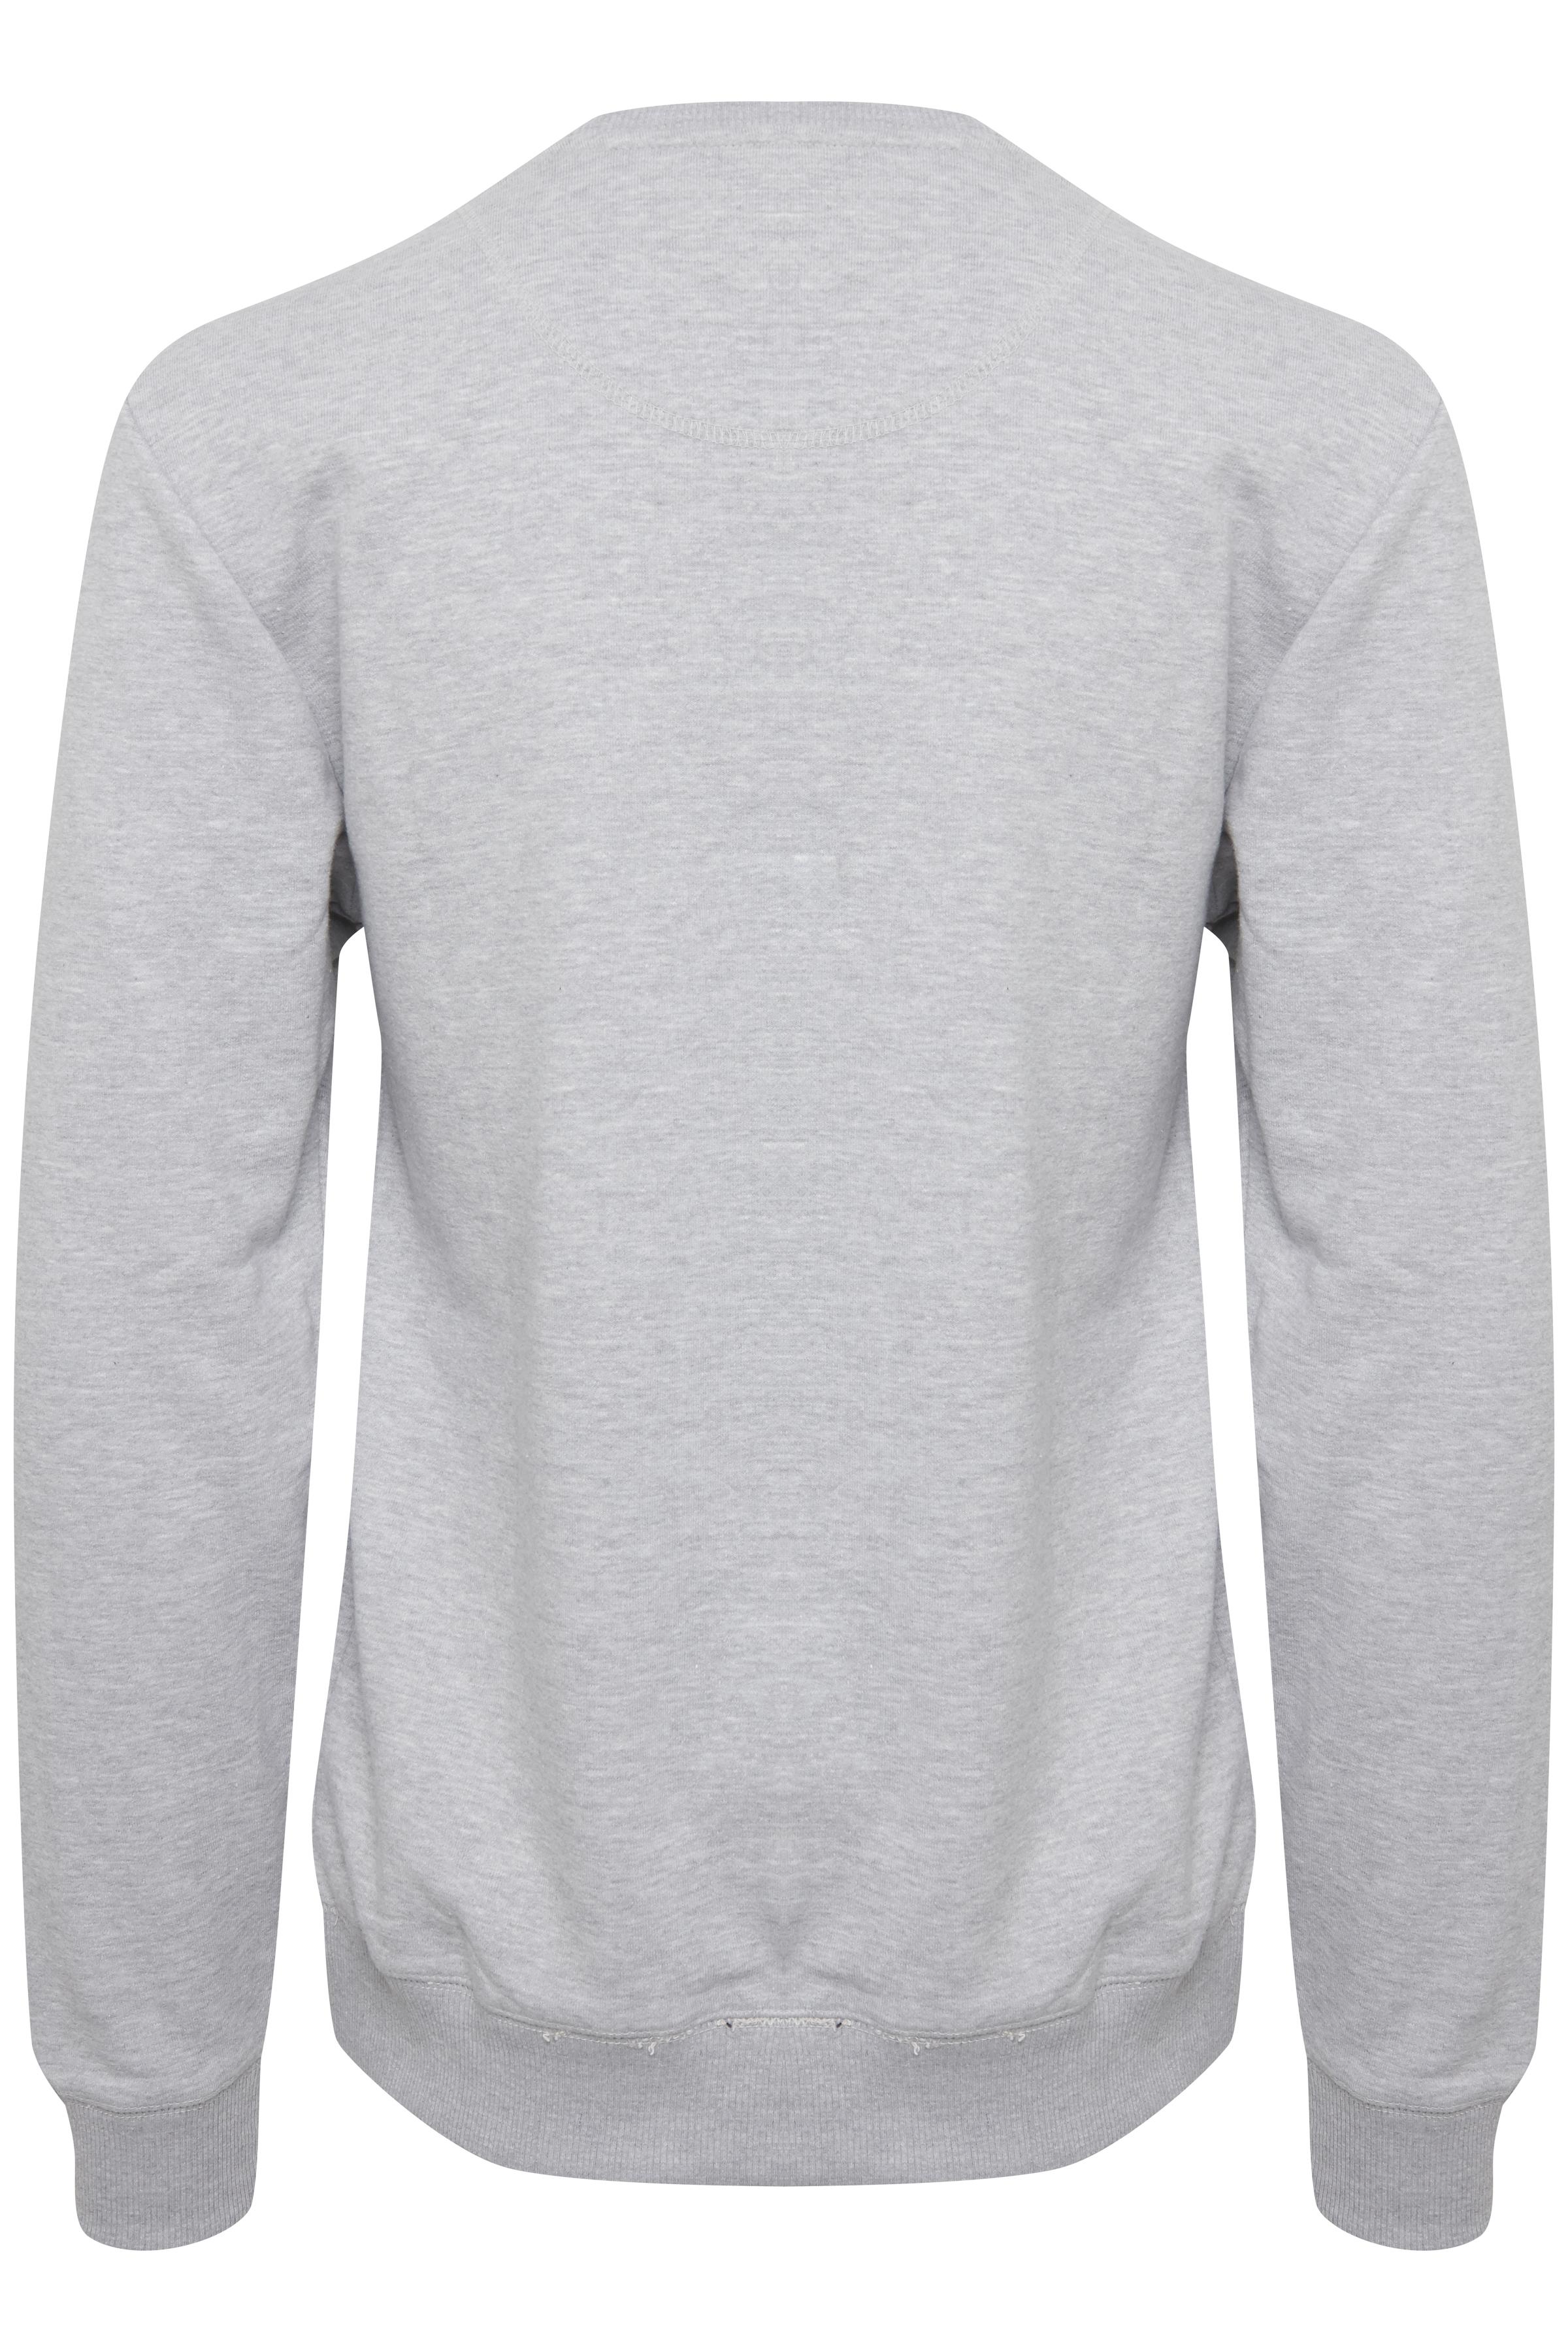 Stone mix Sweatshirt – Køb Stone mix Sweatshirt fra str. M-XXL her